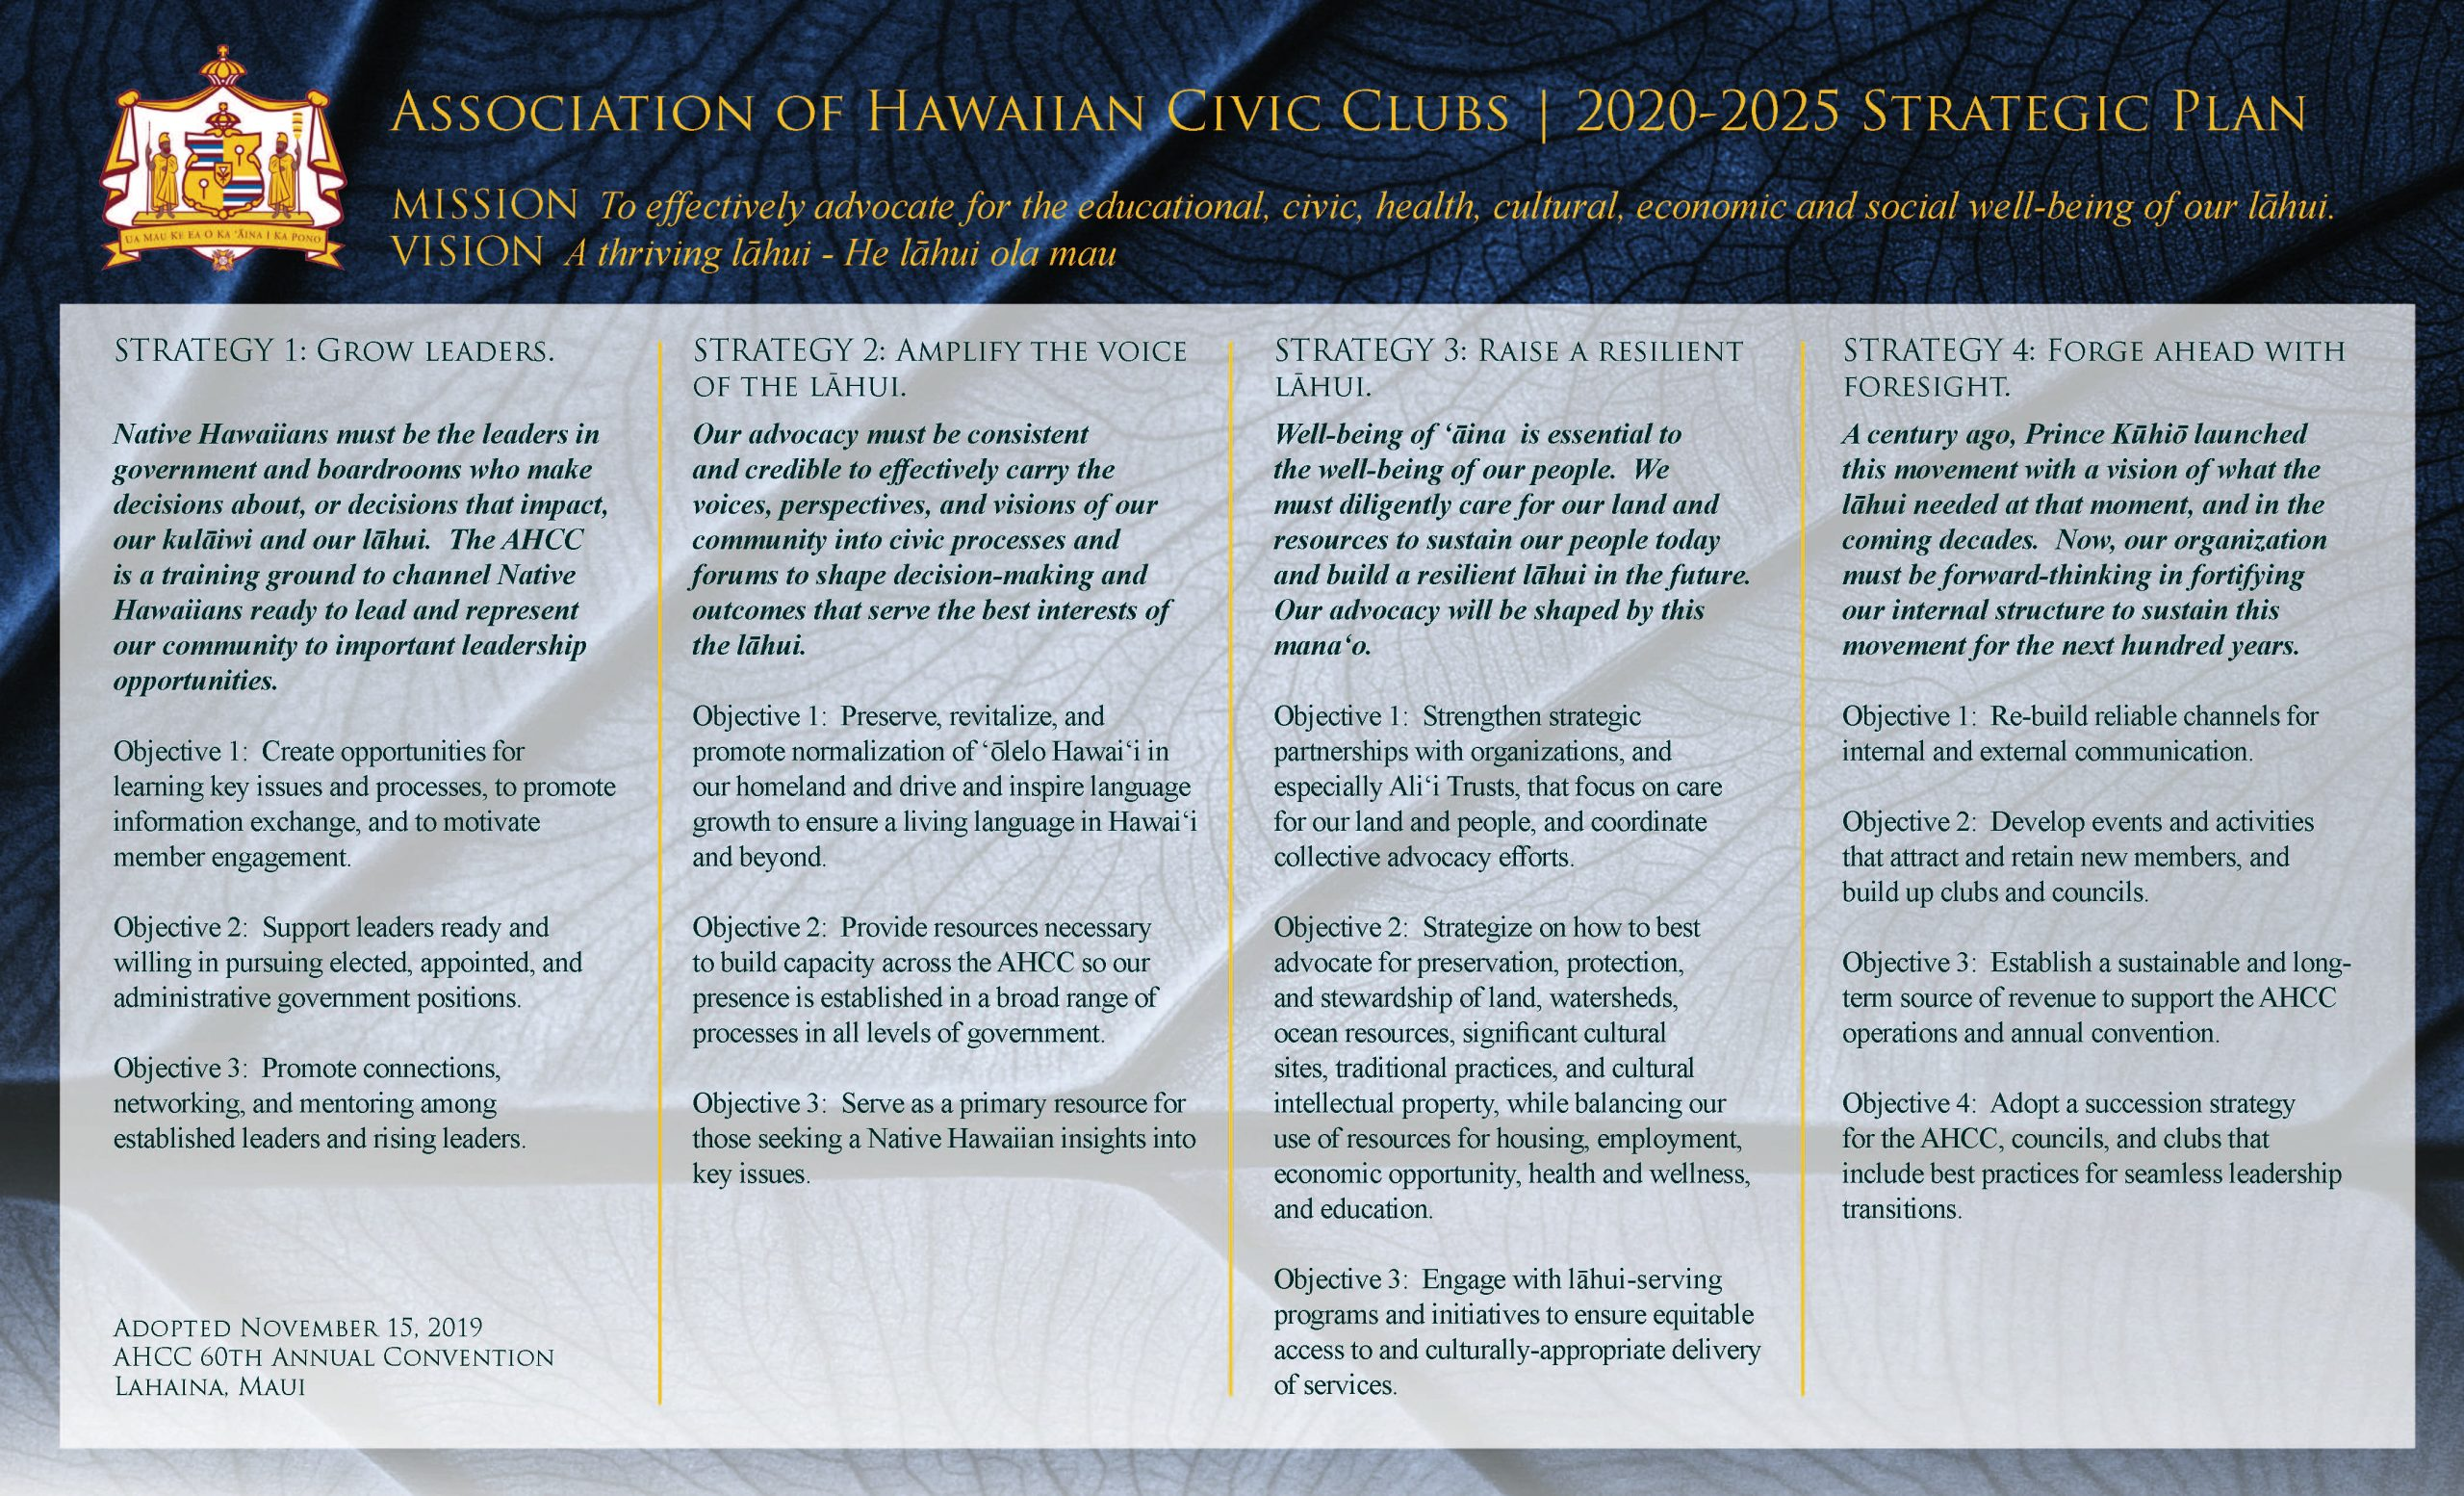 AHCC 2020-2025 Strategic Plan [Adopted 11-15-2019]